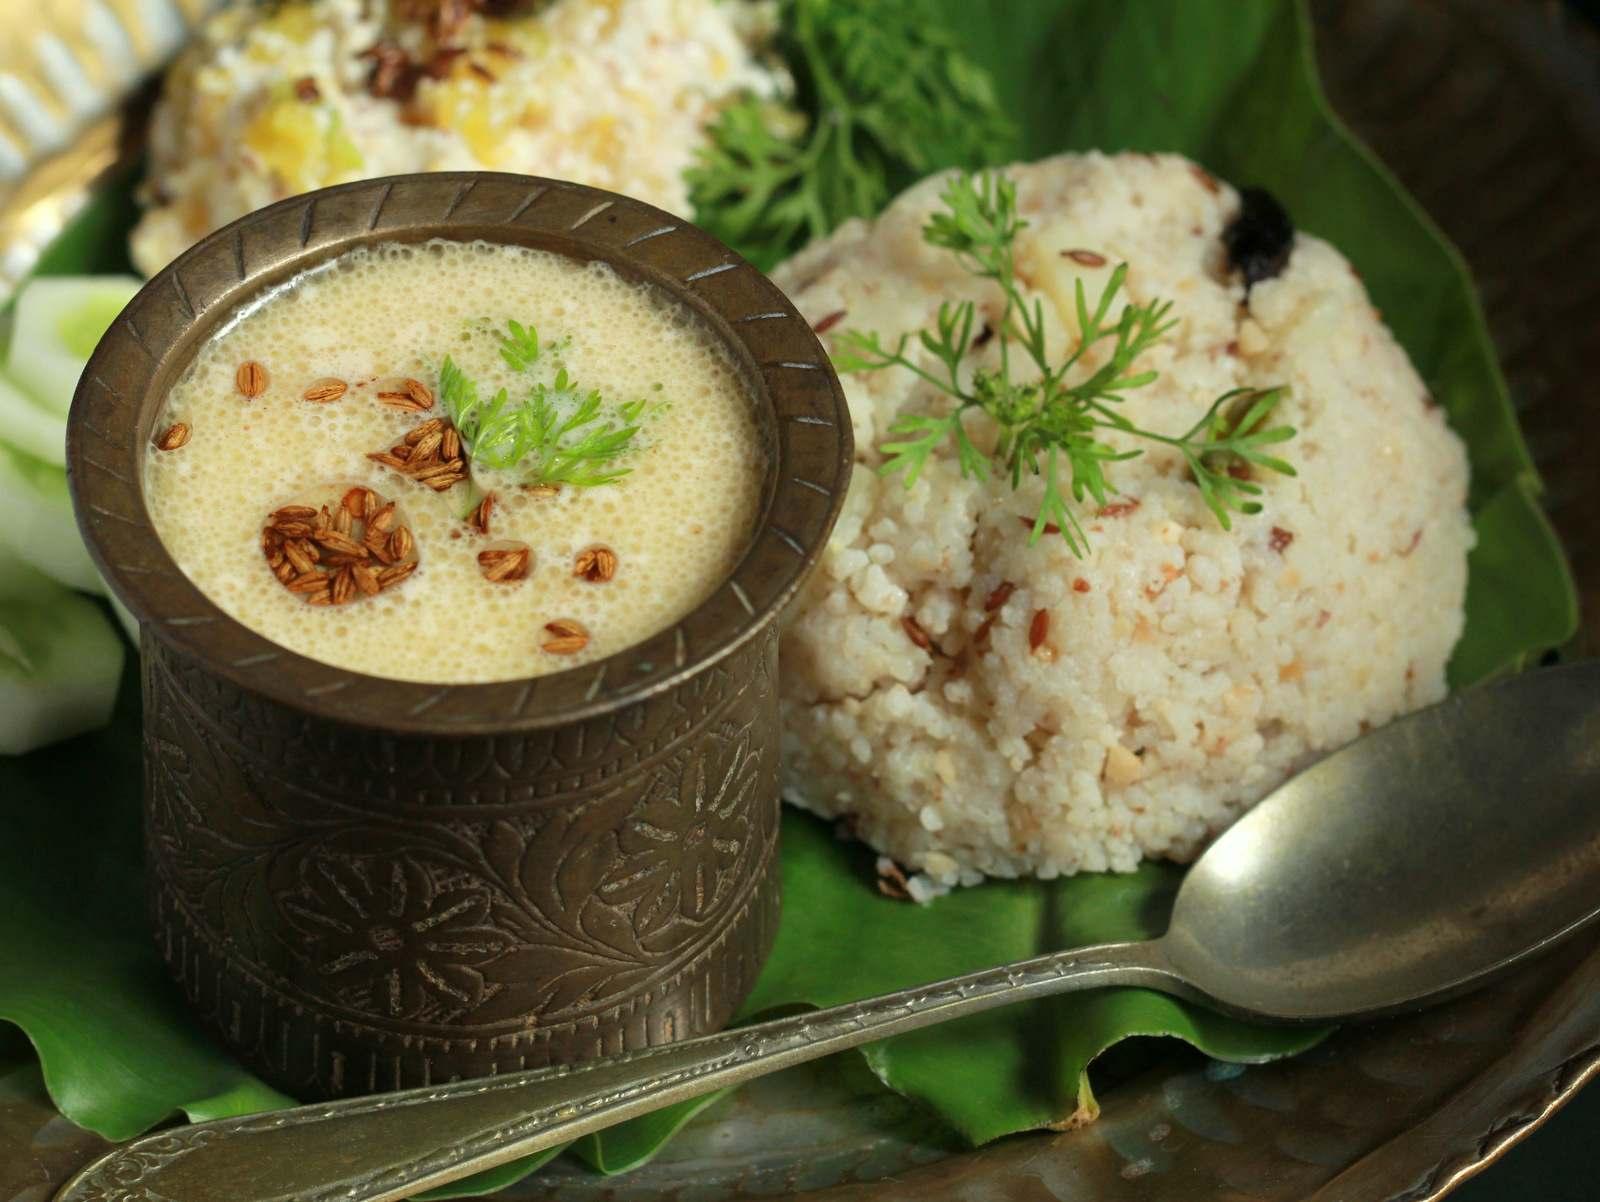 Danyachi amti recipe maharashtrian style groundnut curry by danyachi amti recipe maharashtrian style groundnut curry forumfinder Images